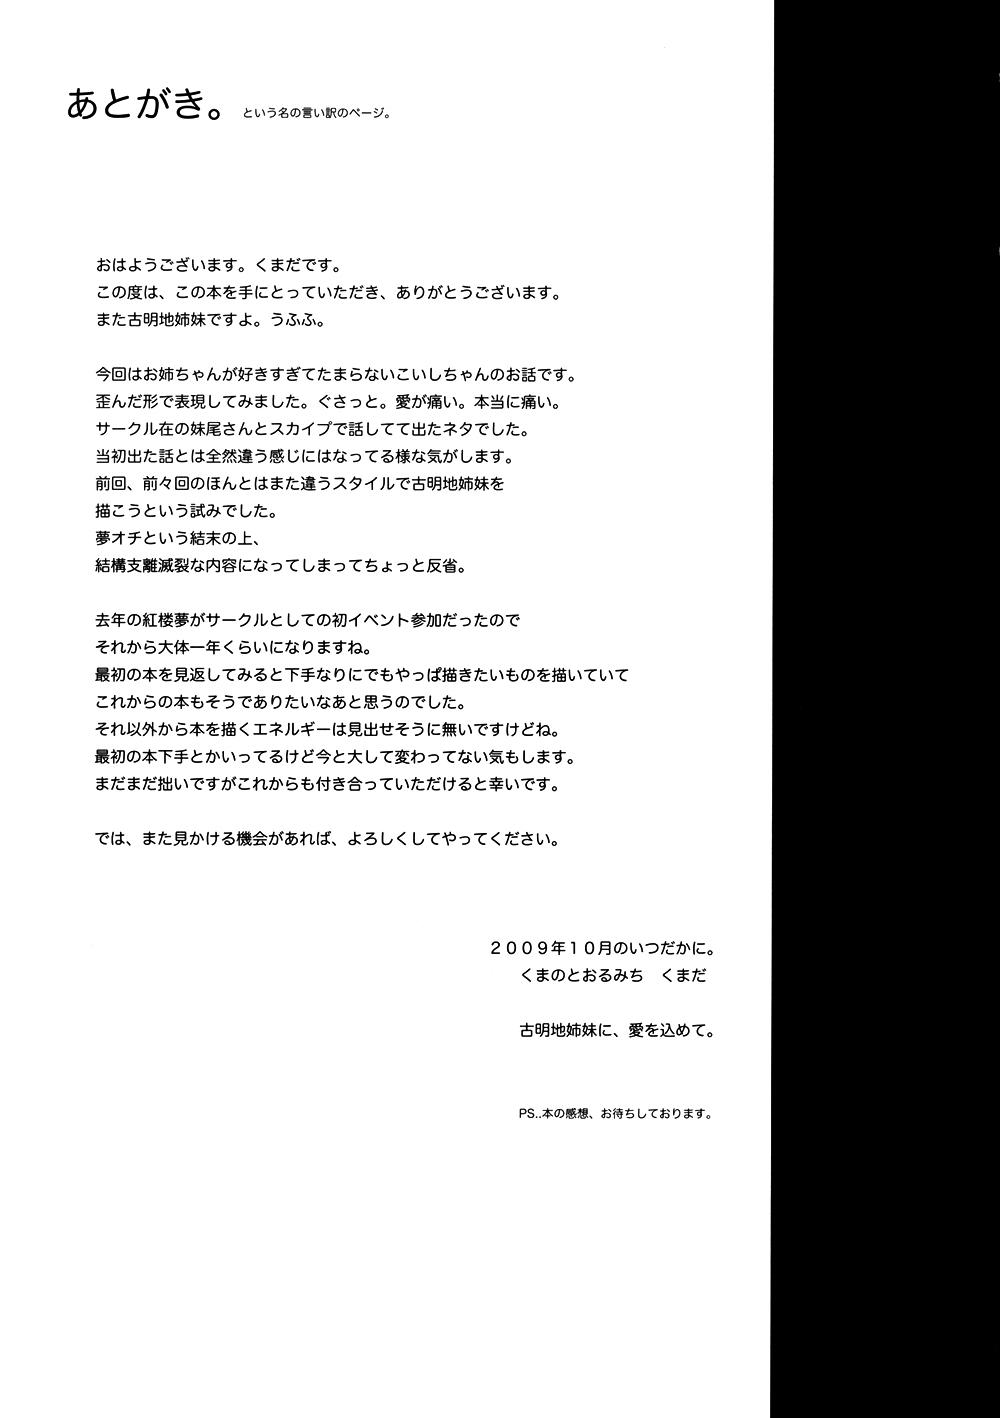 http://db.thaianime.net/images/Tatsuya/idontunderstandmysister21.jpg